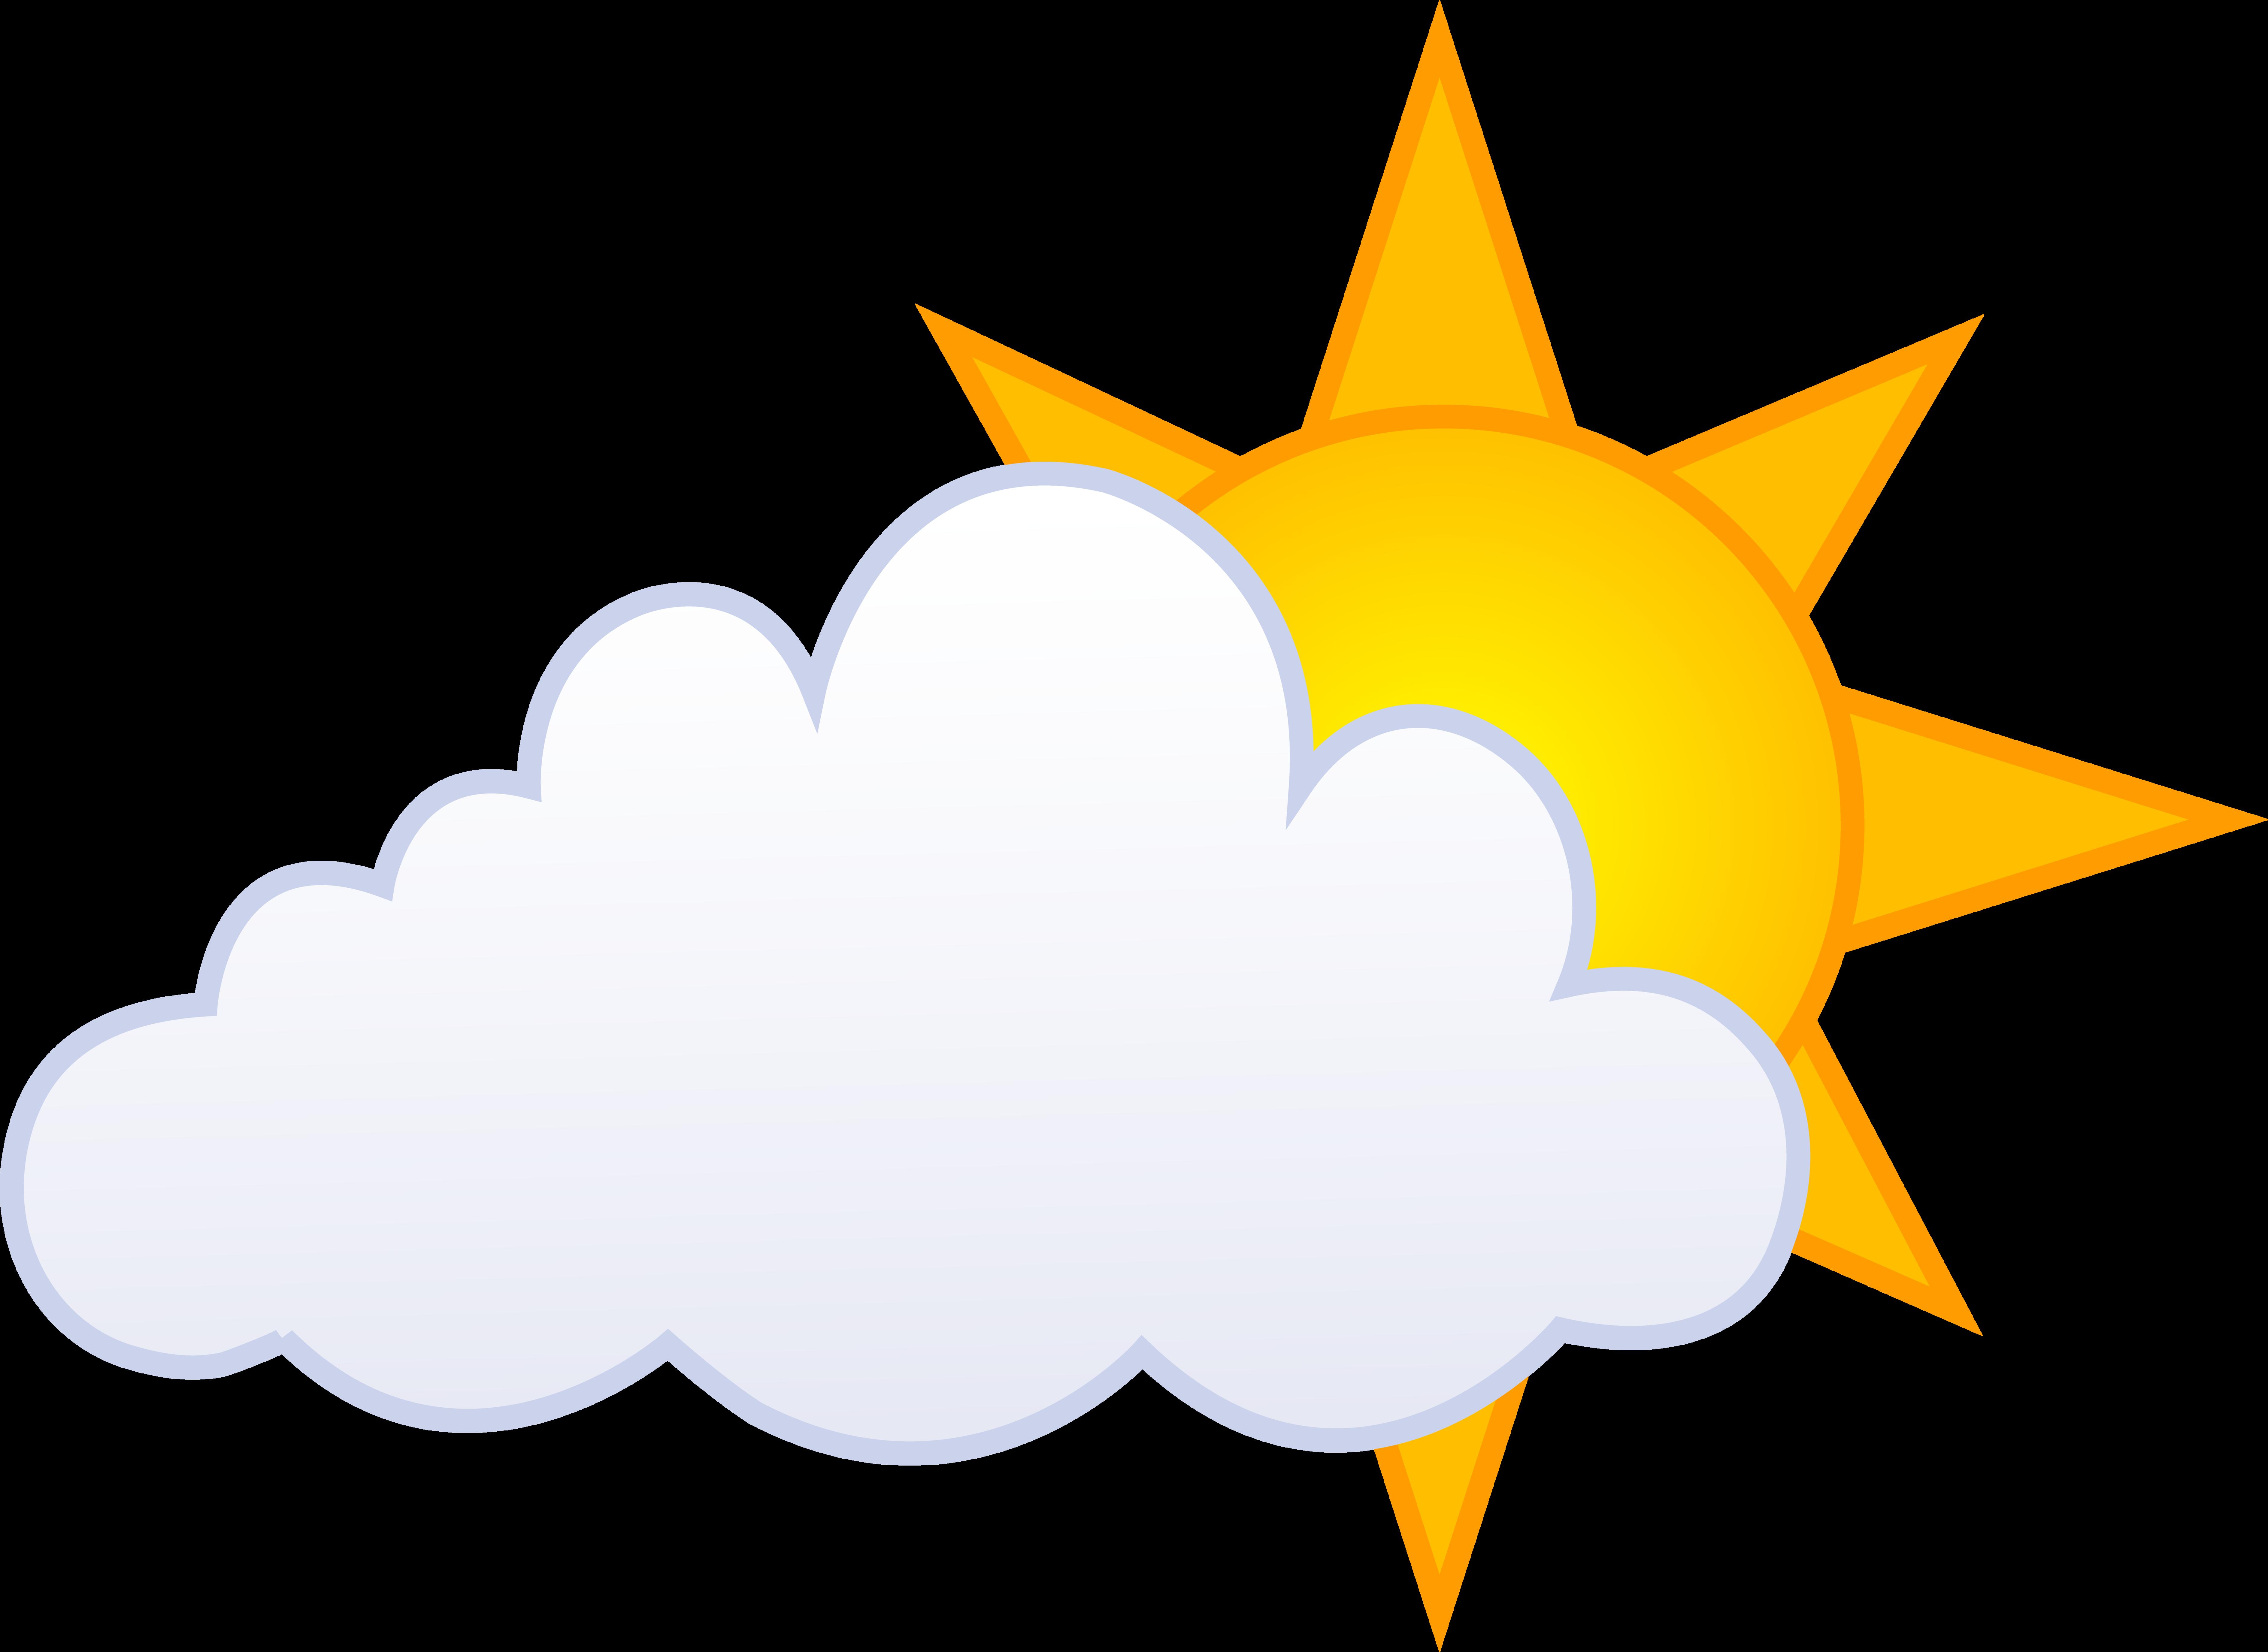 7553x5503 Sunlight Clipart Sunny Weather